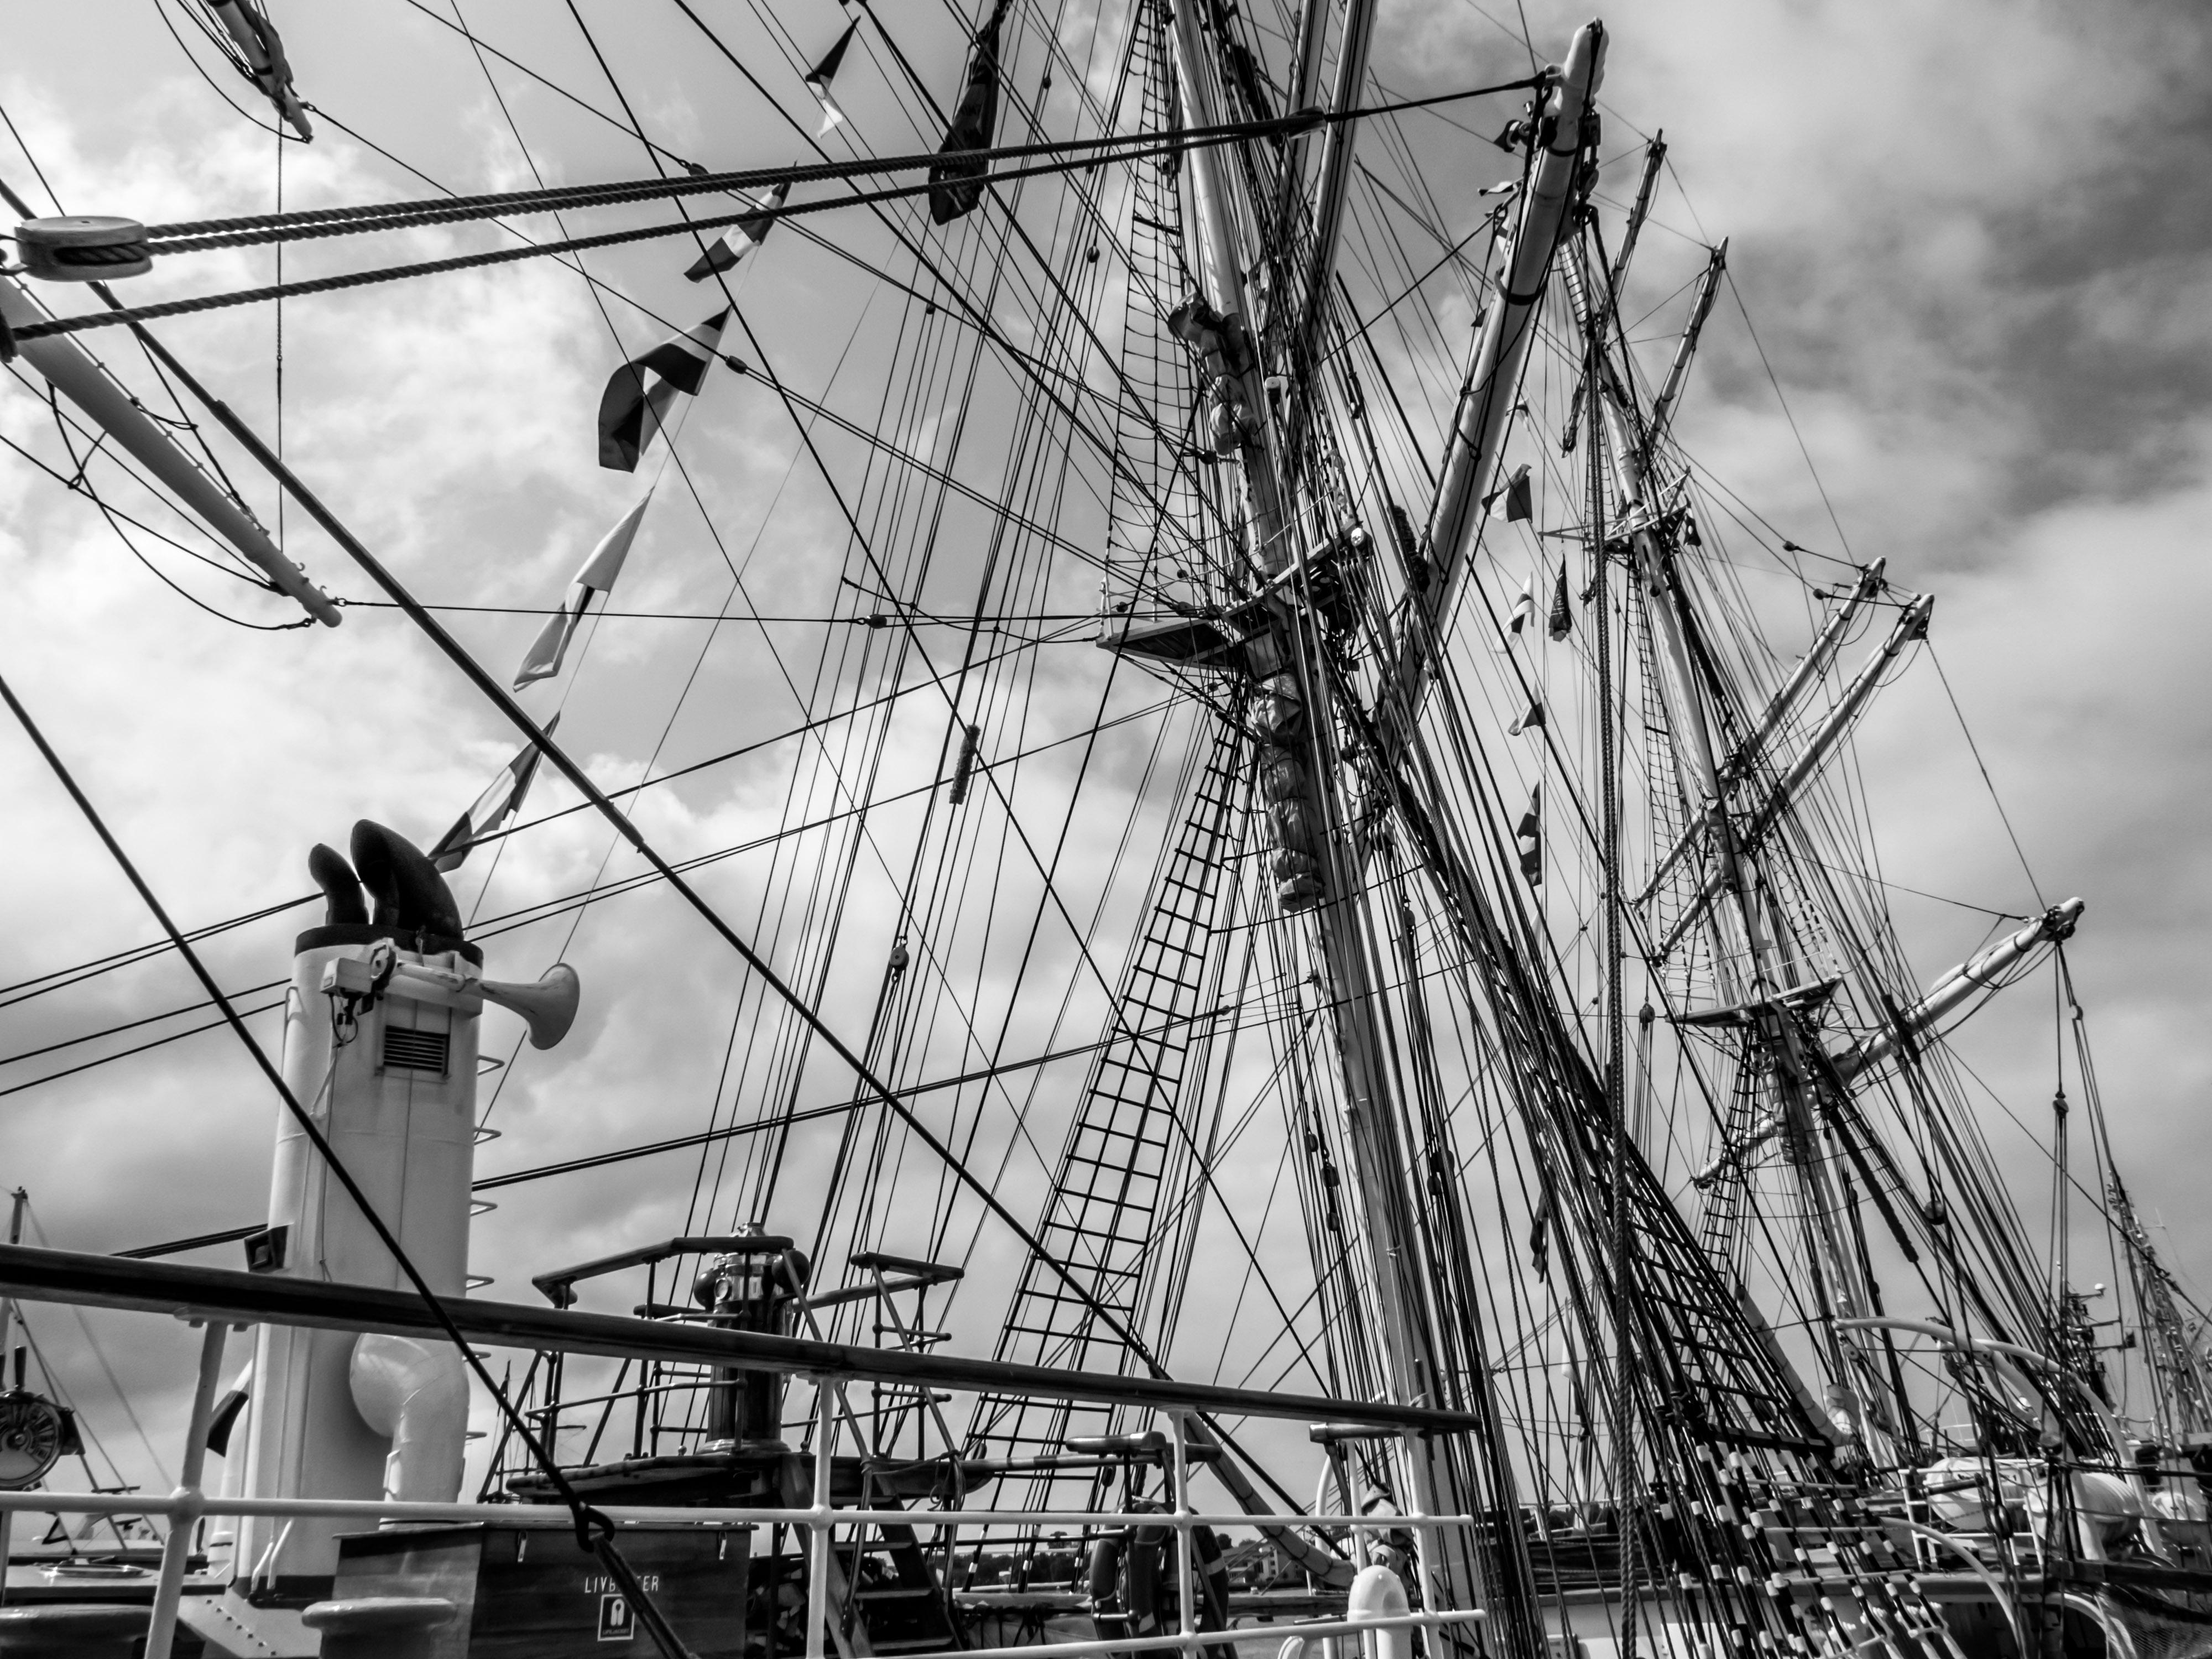 Sailing boats, 2013, Sail, Vessel, Theme, HQ Photo